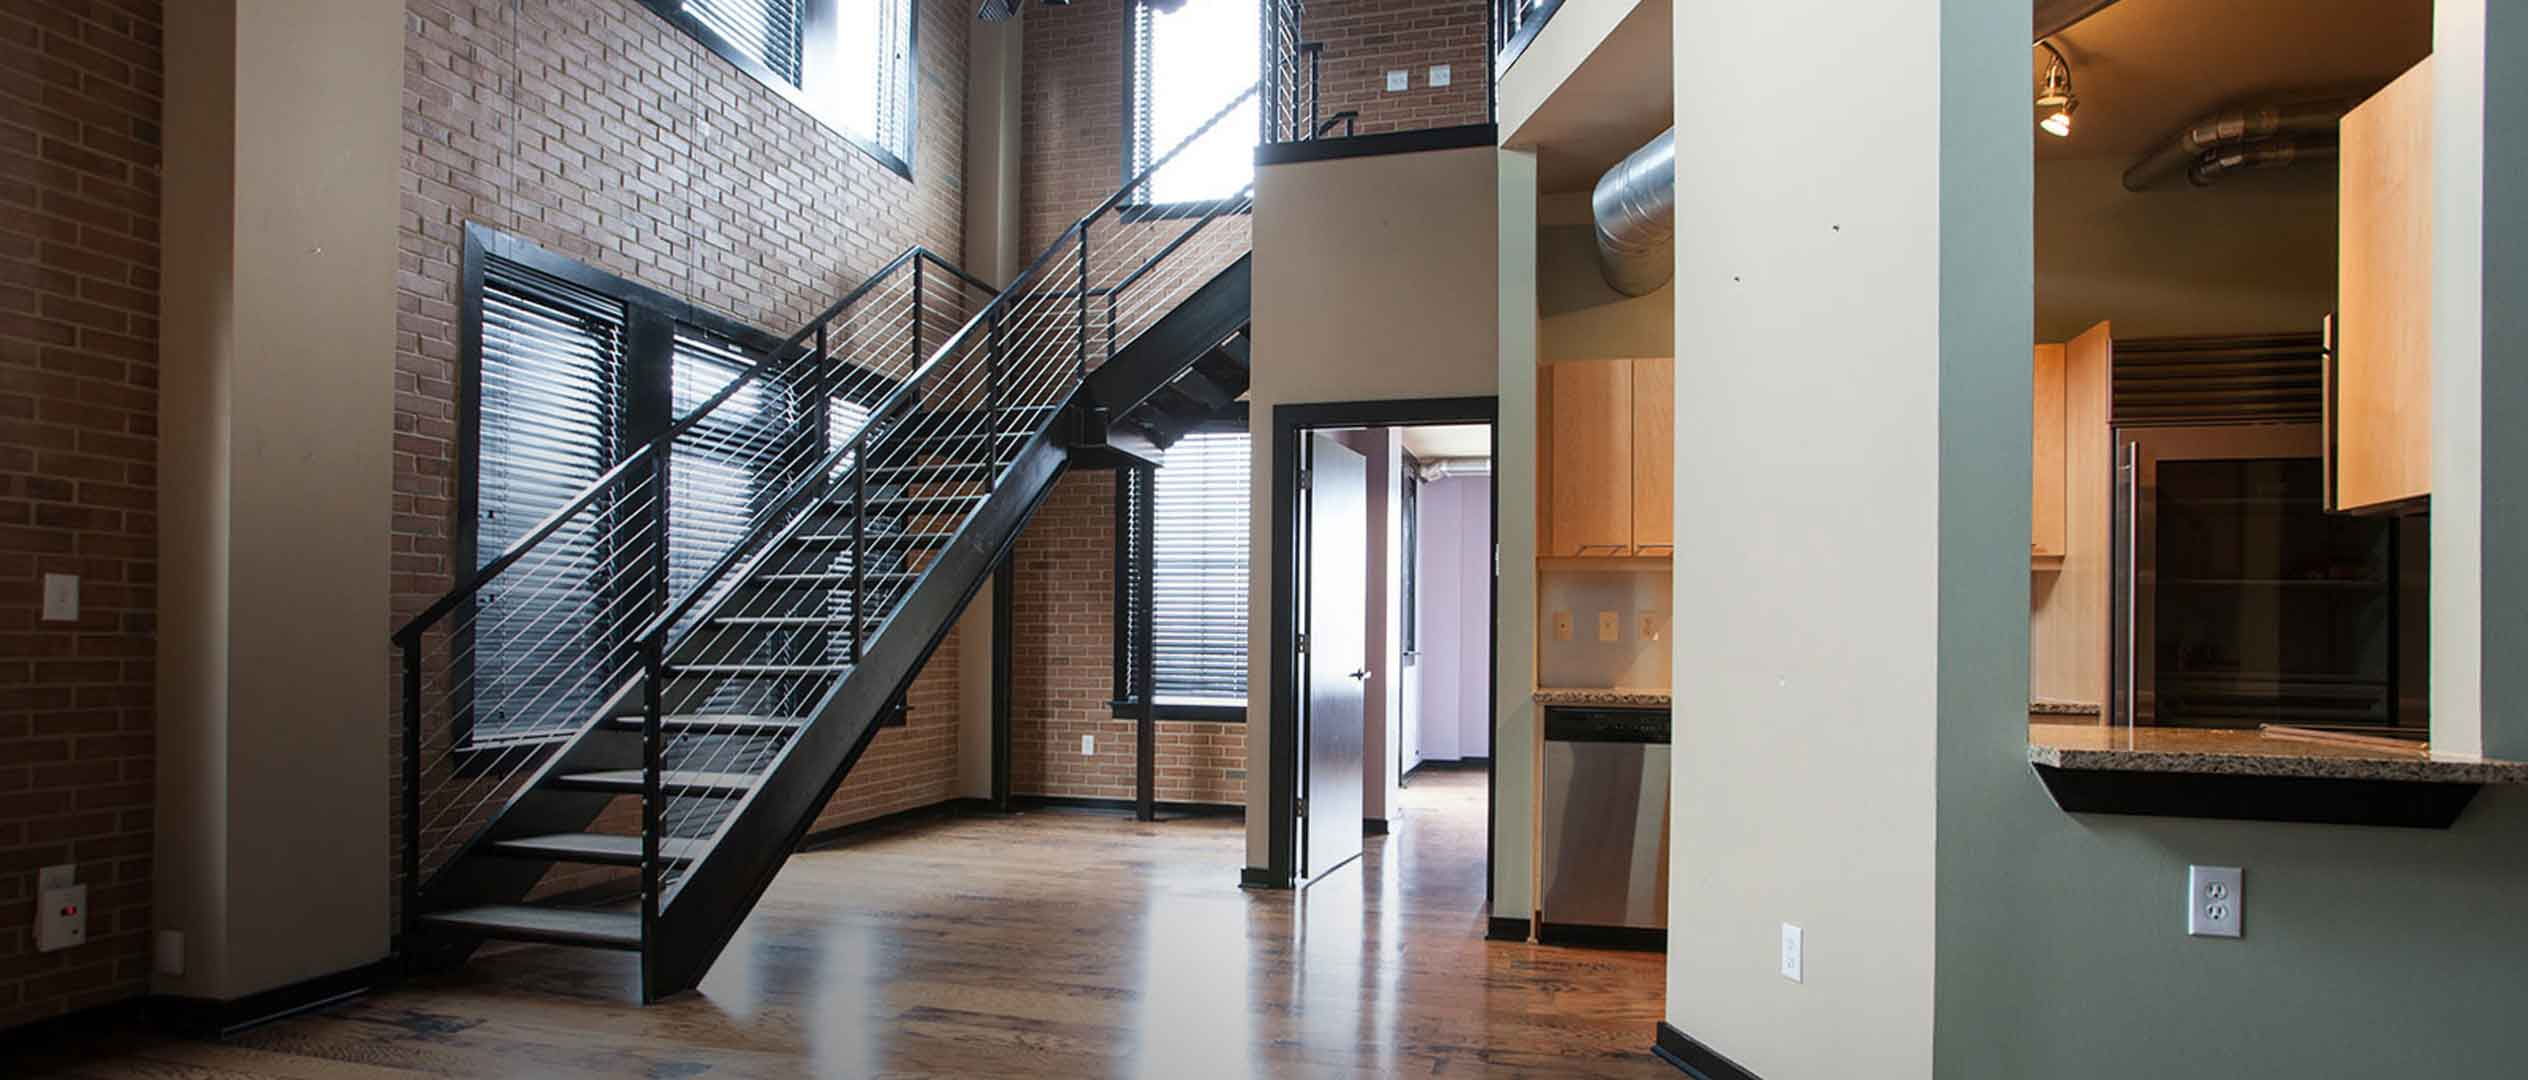 Appartement v randa quimper - Veranda ou uitbreiding ...